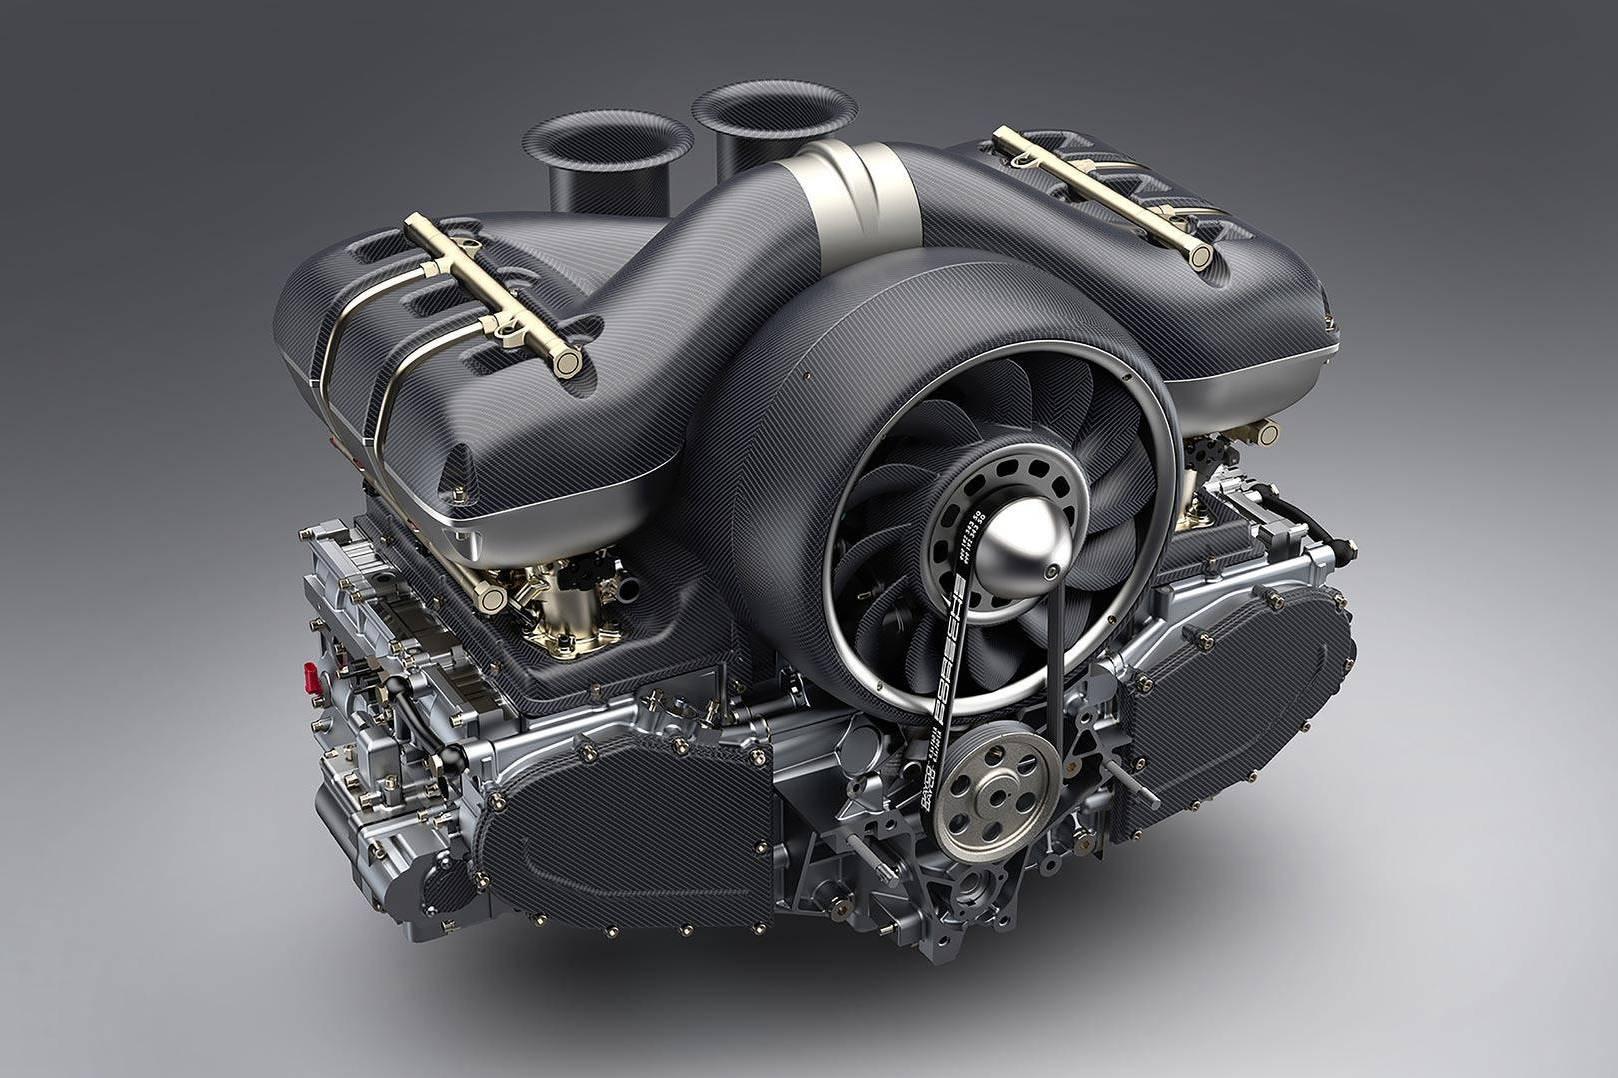 singer vehicle design - williams f1 - blacklist (2).jpg